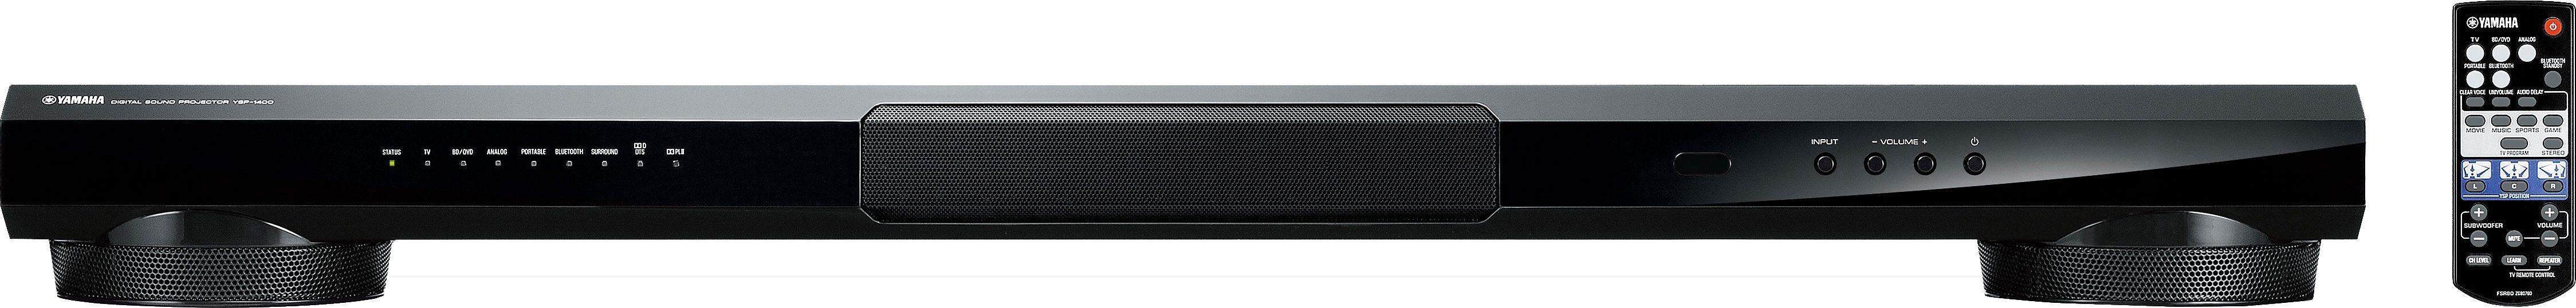 Yamaha YSP-1400 Soundbar mit Bluetooth